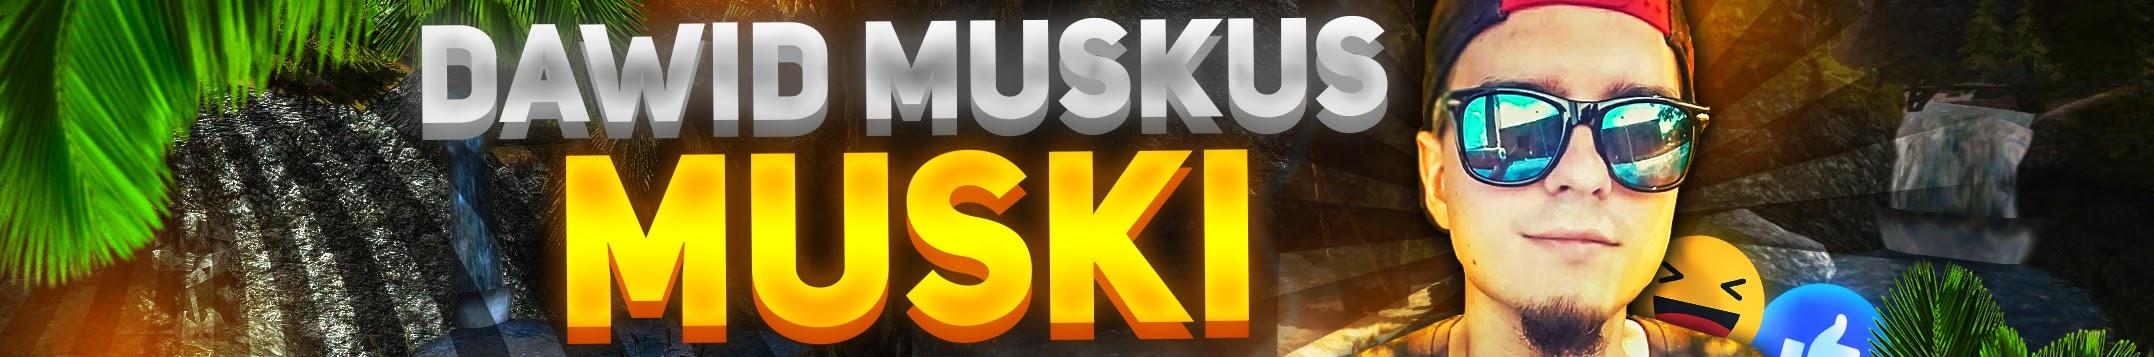 Muski